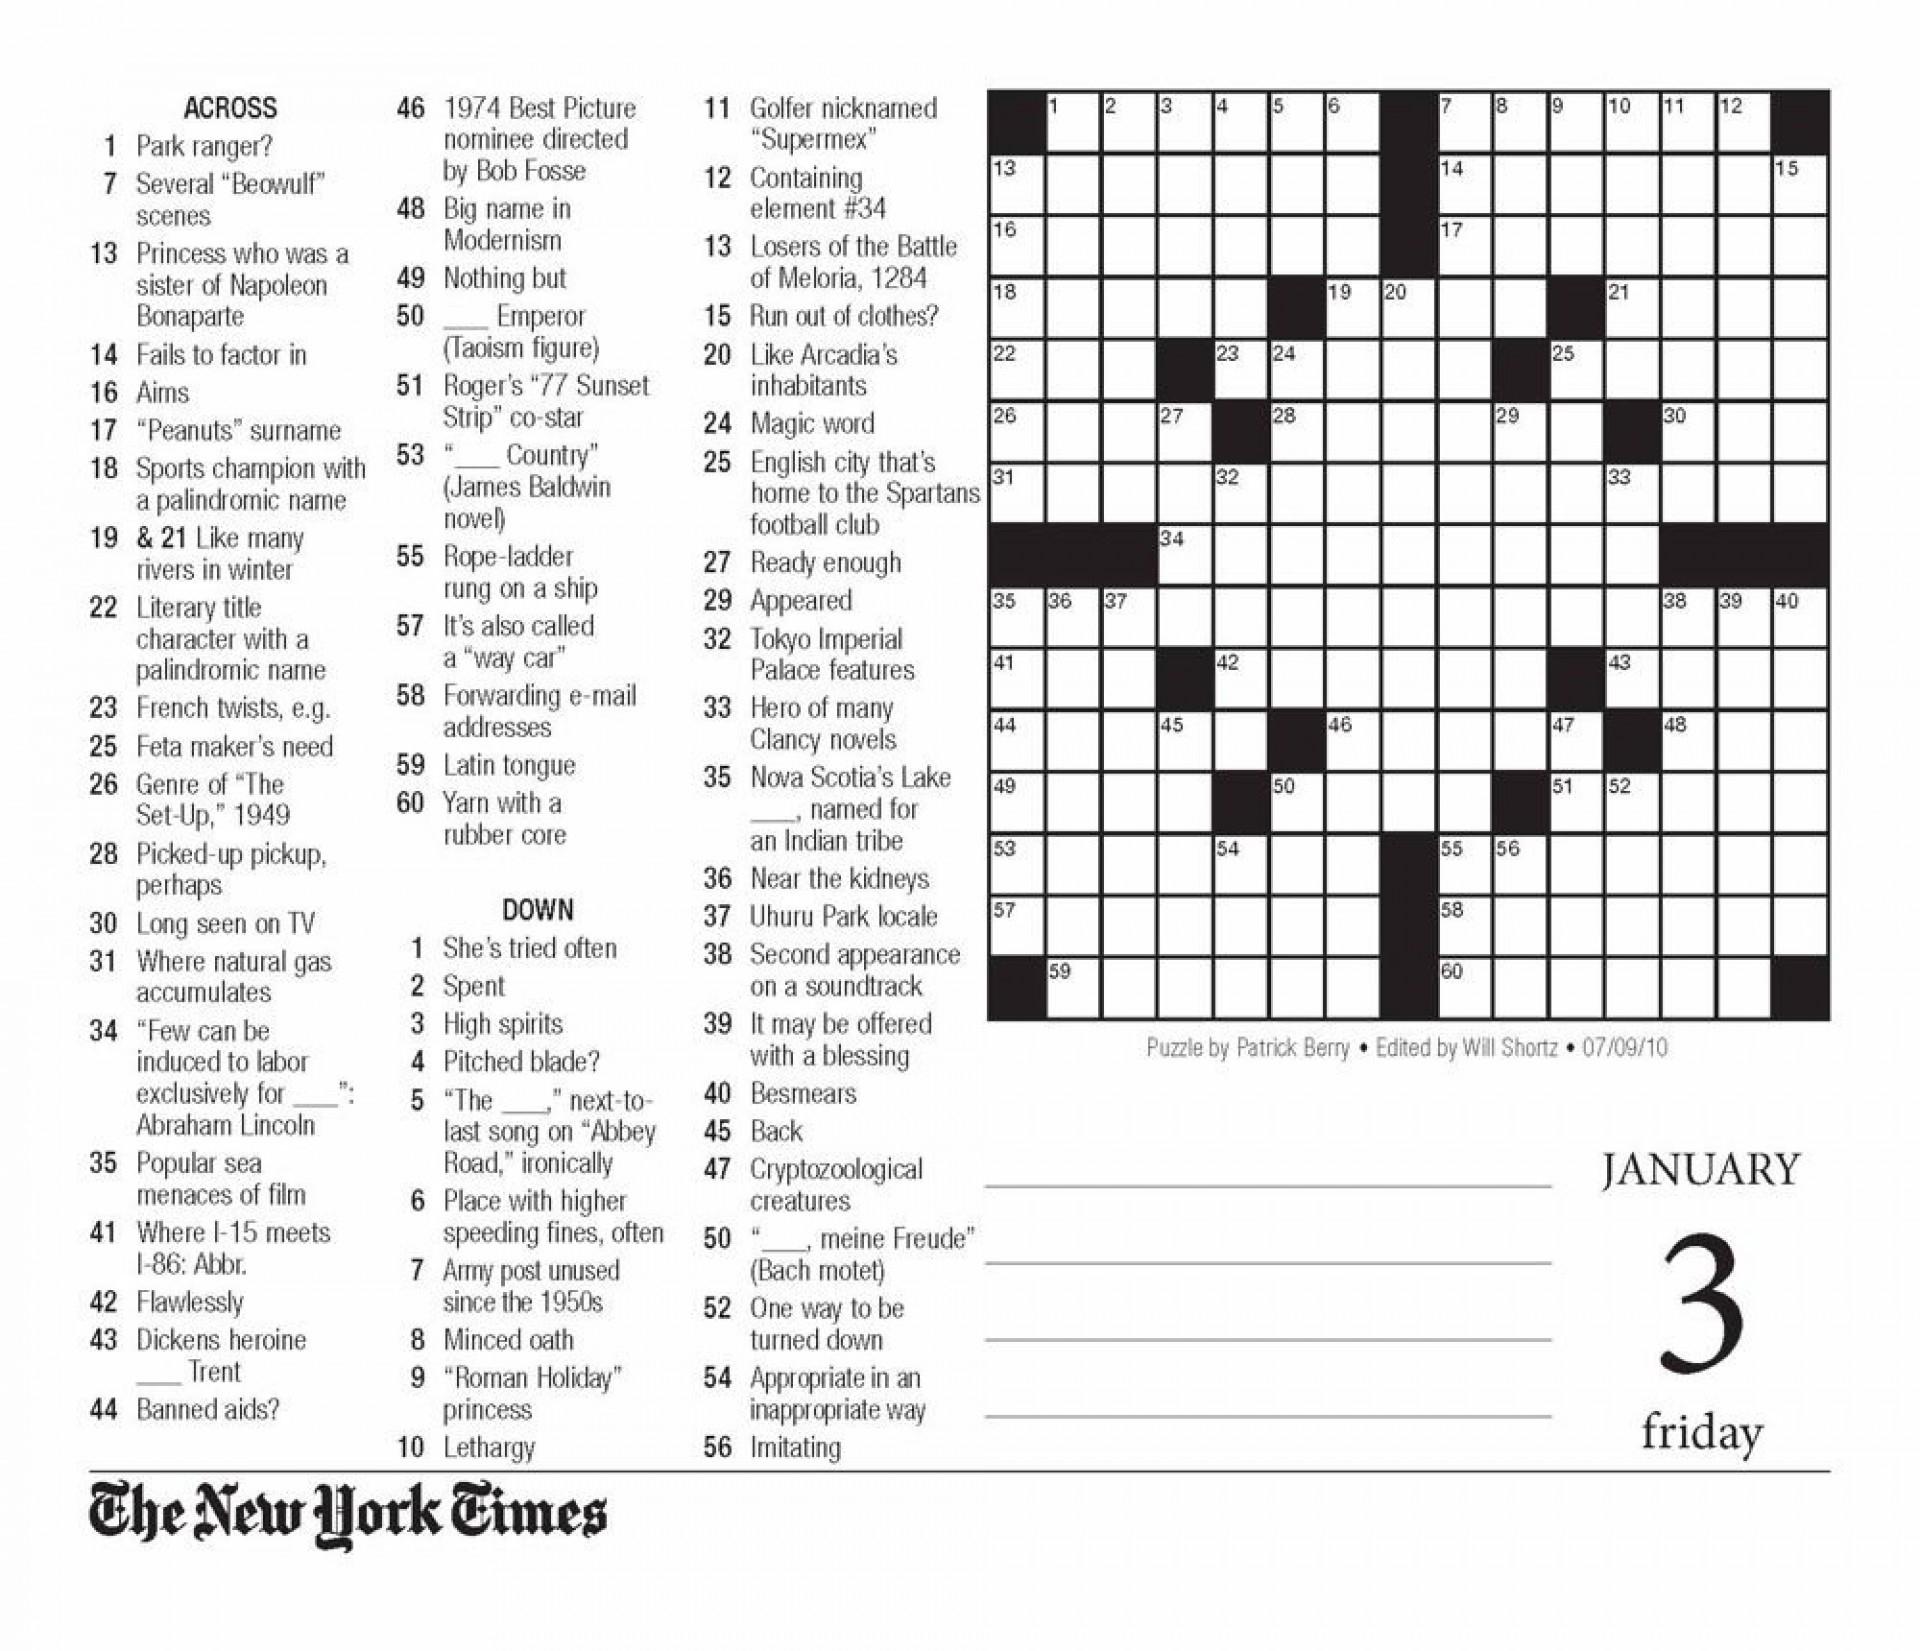 818Tu8Taxel Crossword Puzzle Printable New York Times ~ Themarketonholly - Free Printable Ny Times Crossword Puzzles